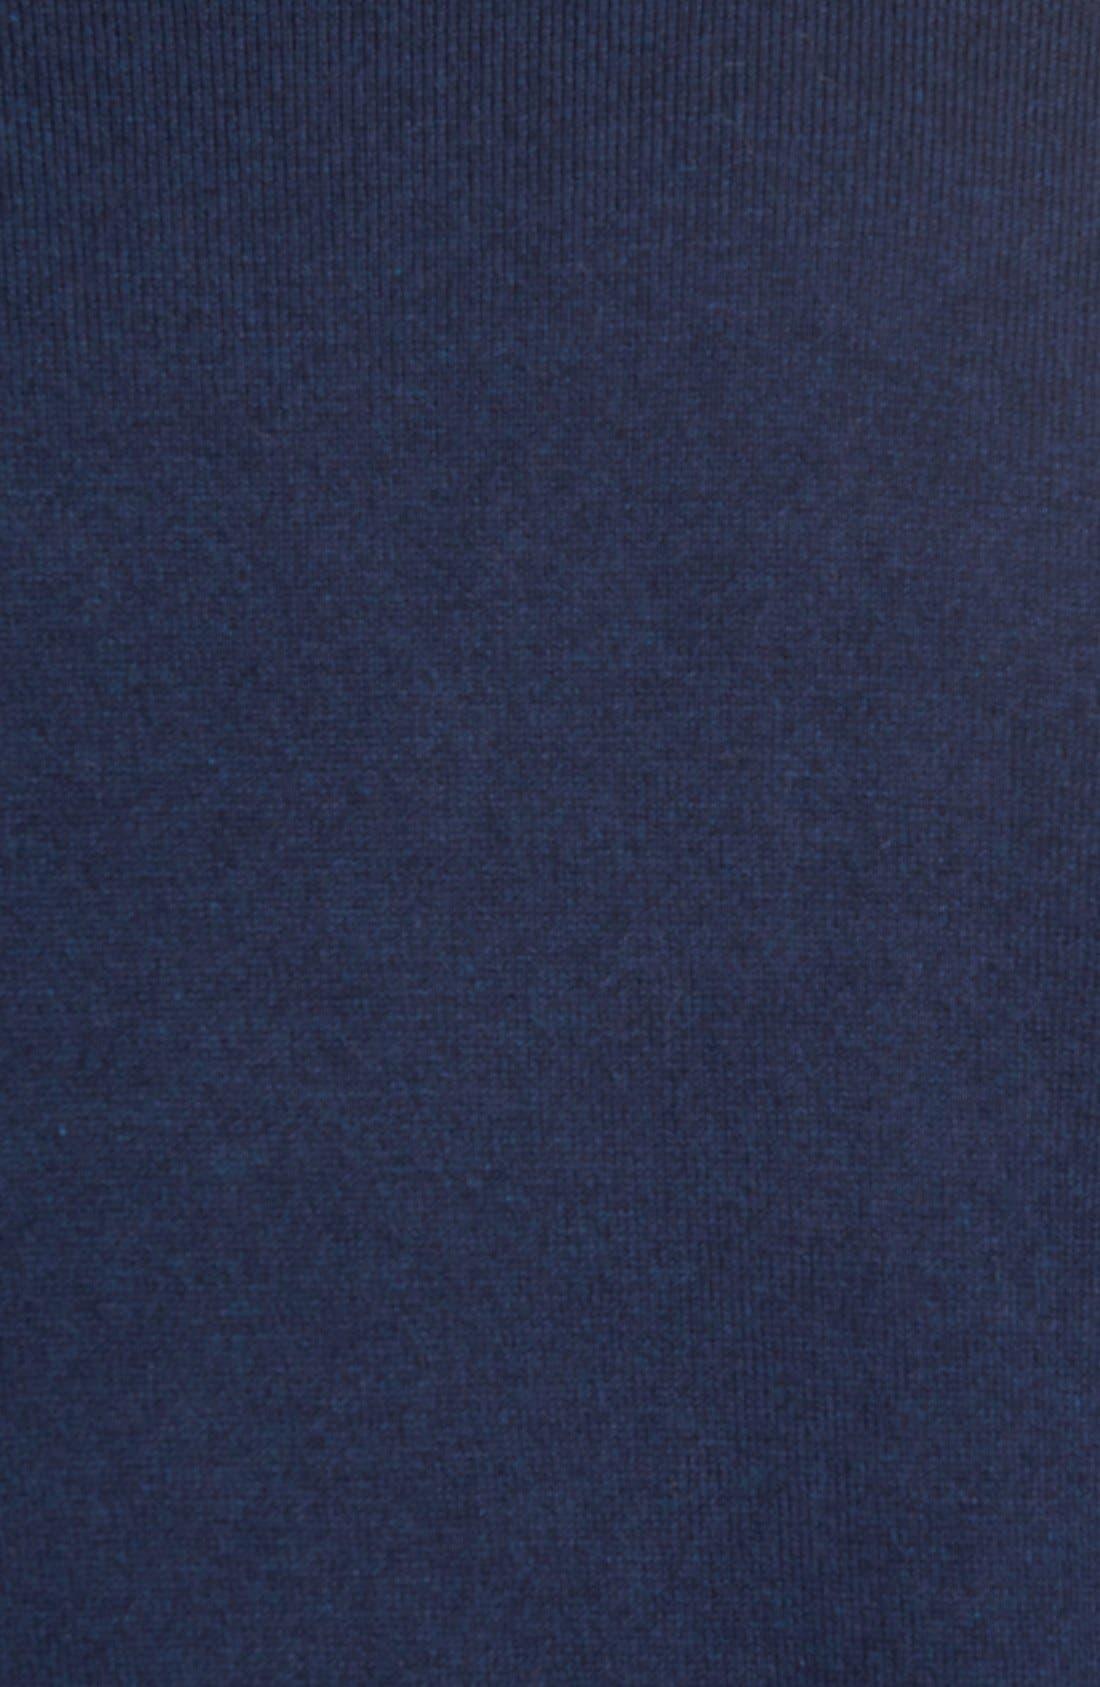 'Jersey Sport' Cotton Blend Crewneck Sweater,                             Alternate thumbnail 37, color,